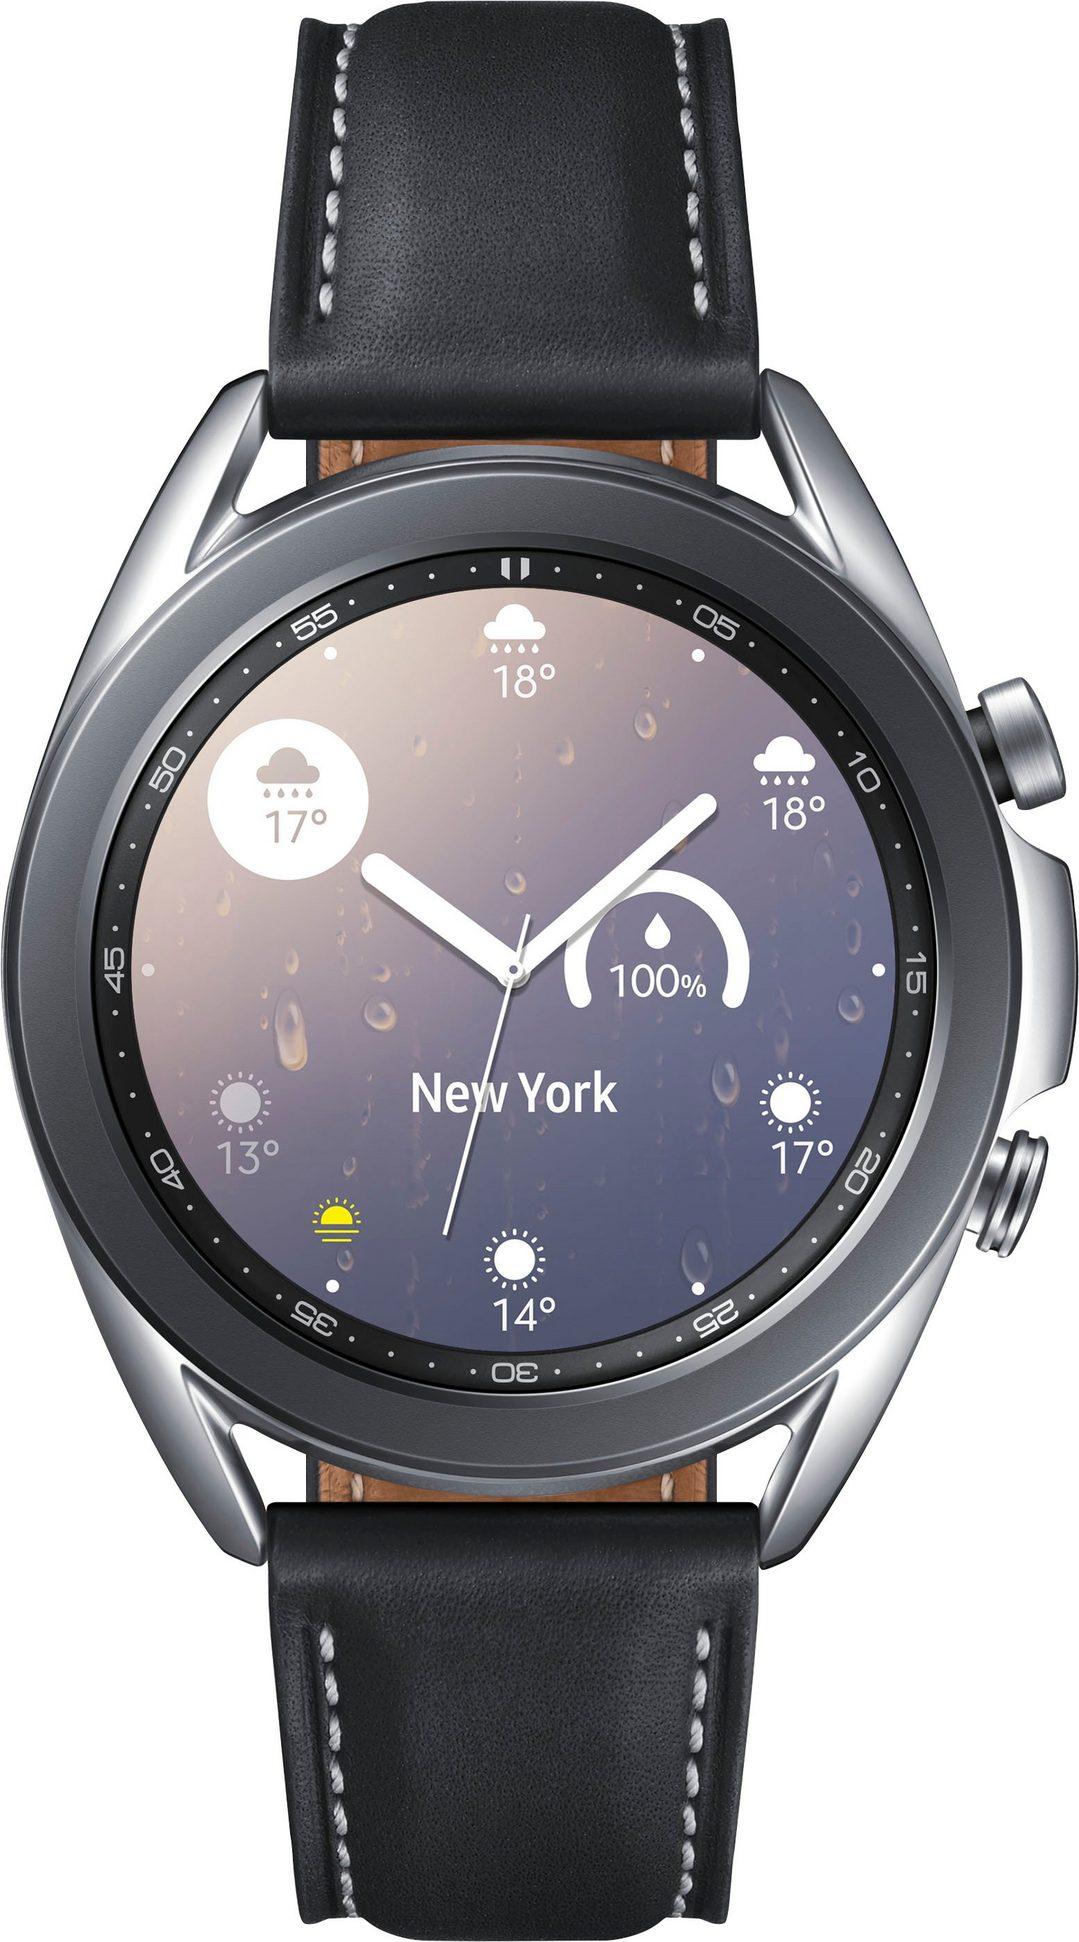 Samsung Galaxy Watch 3, Edelstahl, 41 mm, Bluetooth (SM-R850) Smartwatch (3 cm/1,2 Zoll) Mystic Silver oder Mystic Bronze